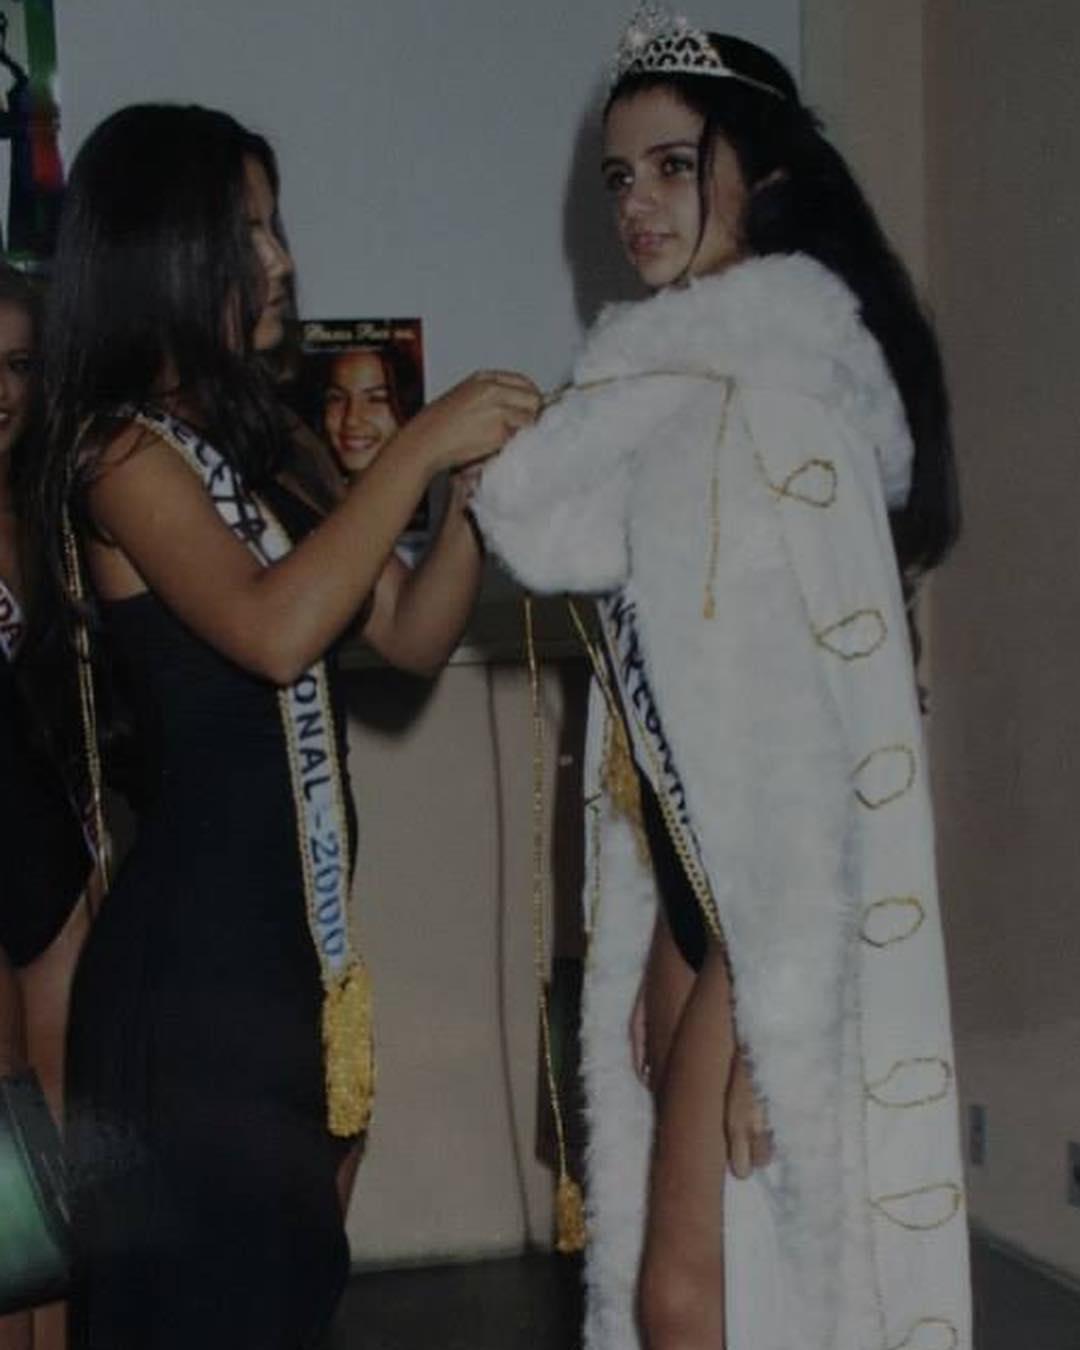 rayana carvalho, miss pernambuco 2006. - Página 54 46781710